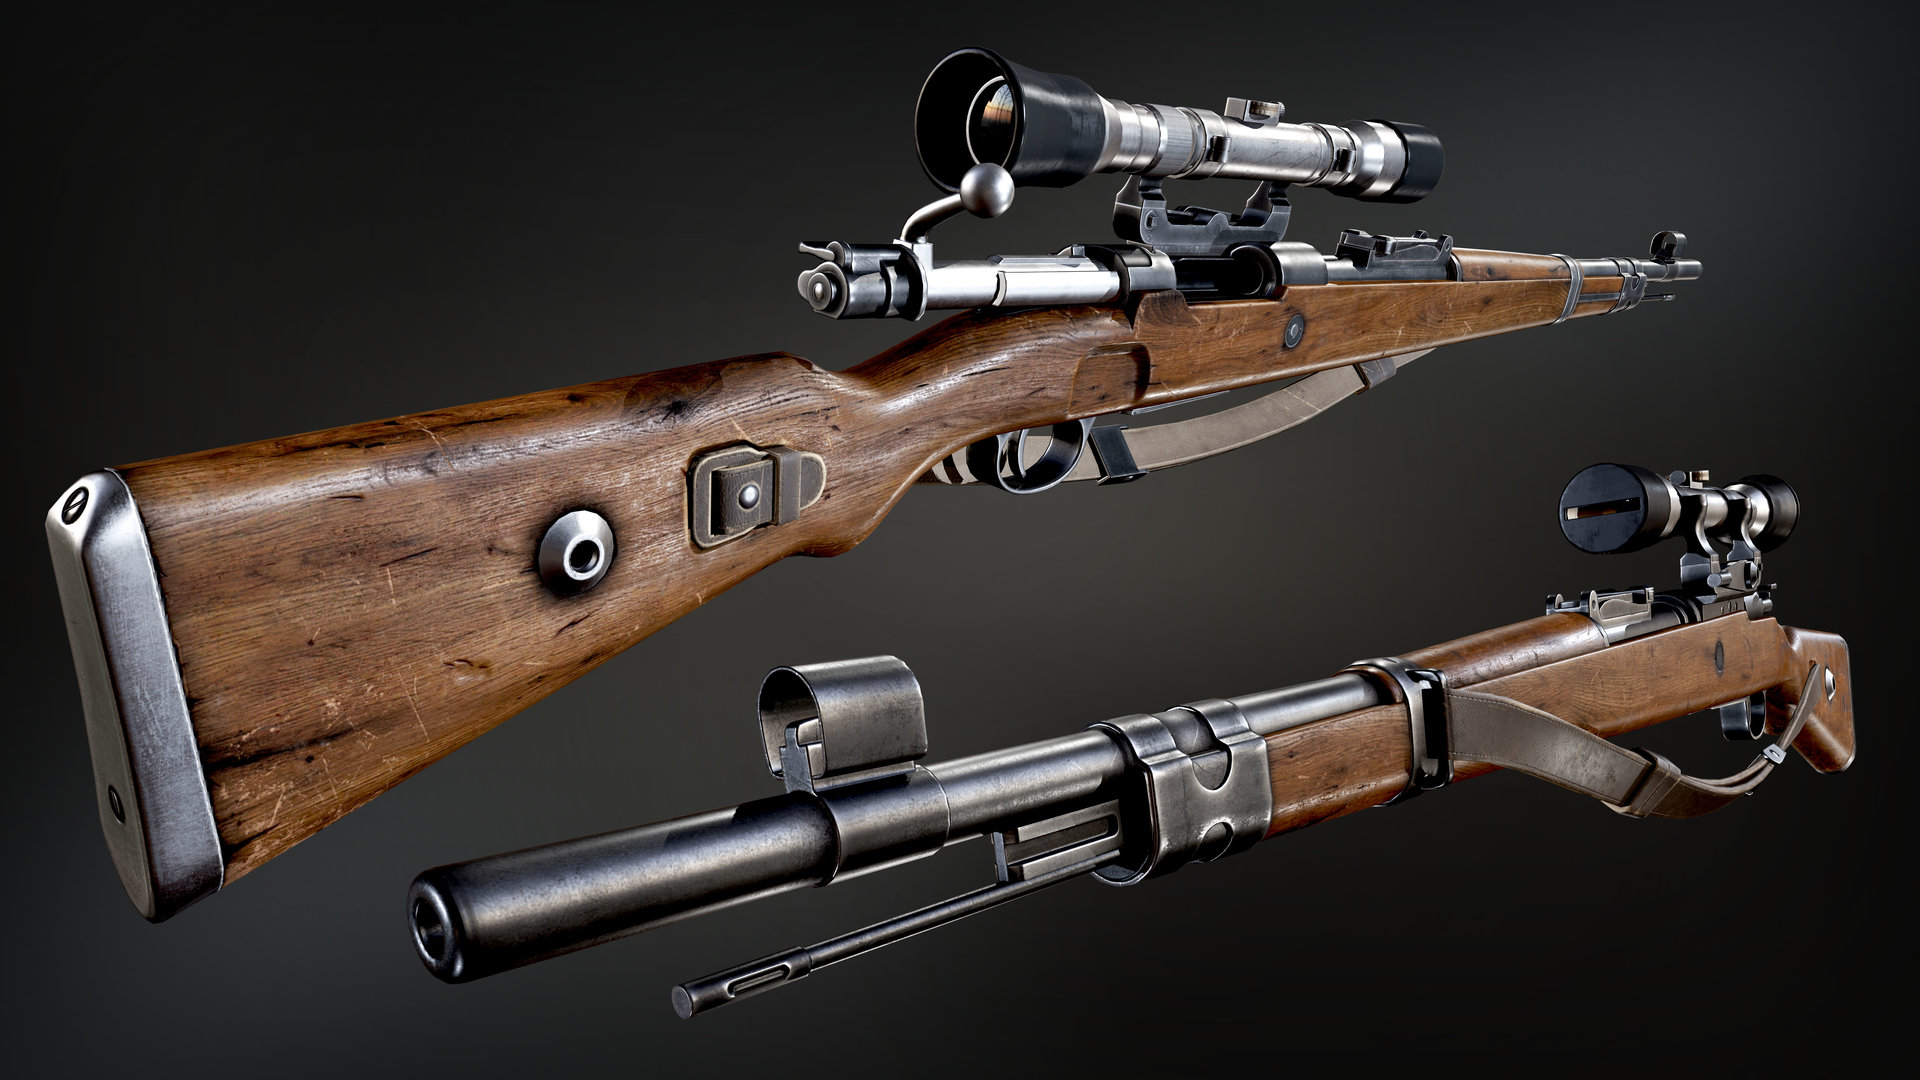 Kar98 Pubg Hd Wallpaper: WW2 Kar 98 Mauser Sniper Rifle With Bayonet